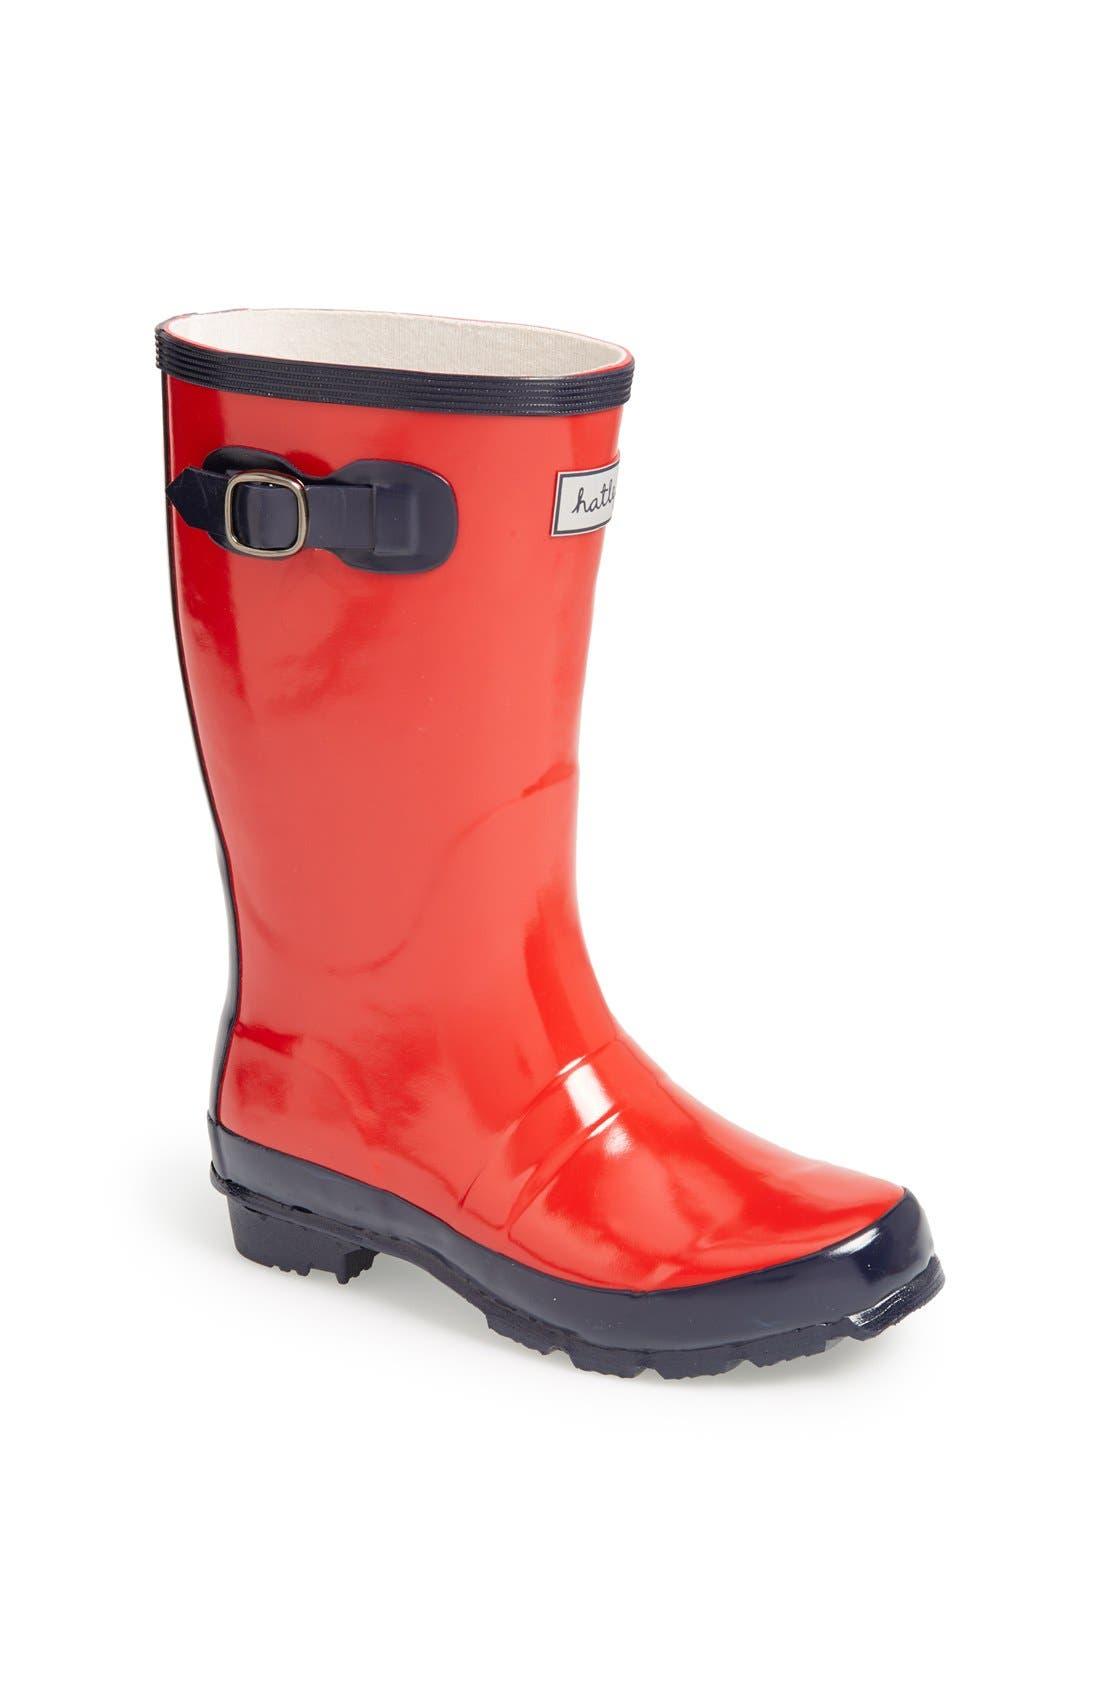 Main Image - Hatley 'Splash' Rain Boot (Toddler & Little Kid)